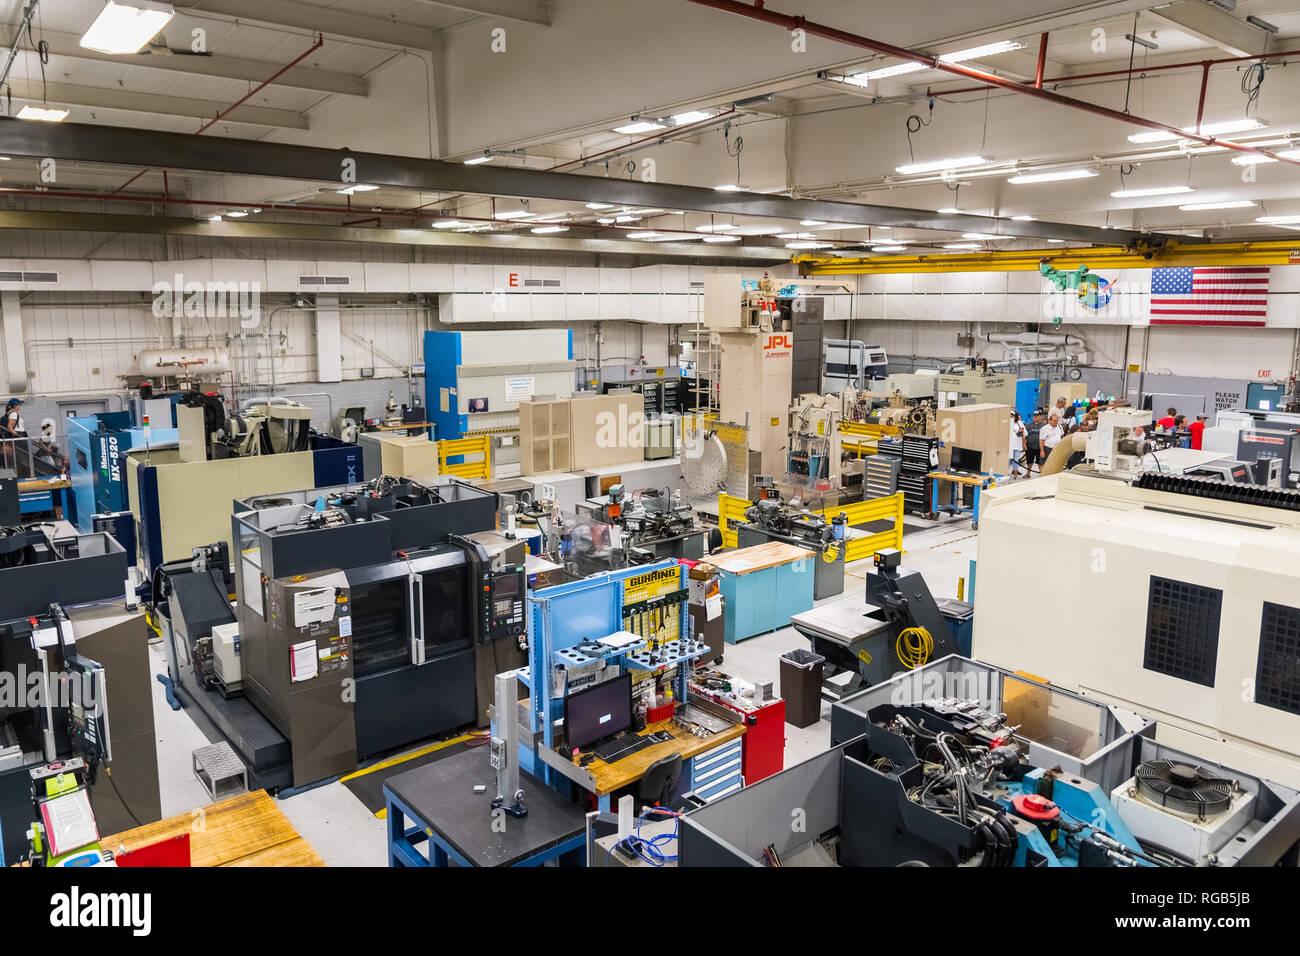 June 10, 2018 La Canada Flintridge / CA / USA -  Interior view of one of the rooms of the Spacecraft Fabrication Facility, the Jet Propulsion Laborato - Stock Image